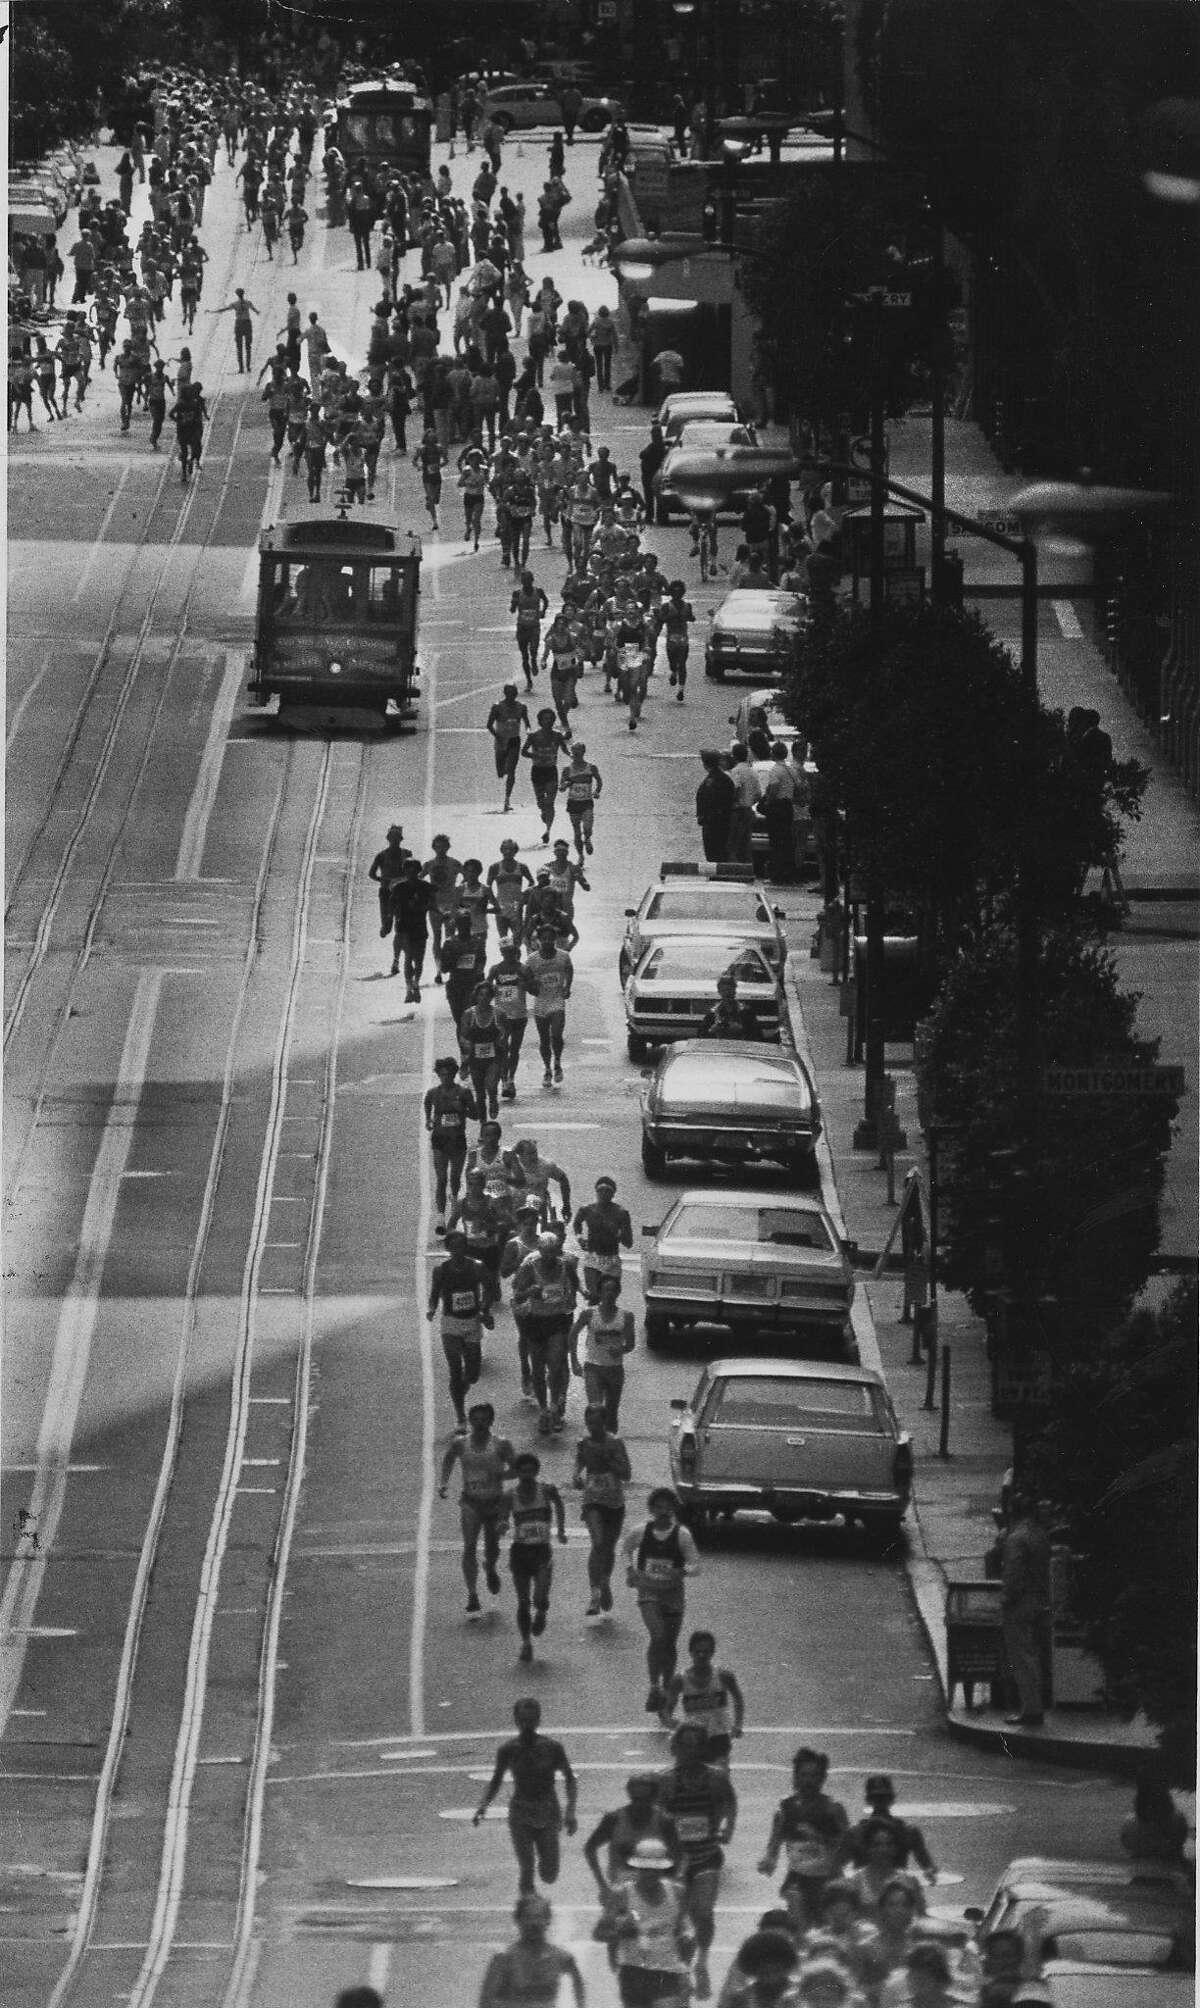 Runners on California St. during the San Francisco Marathon. Photo ran 07/12/1982.